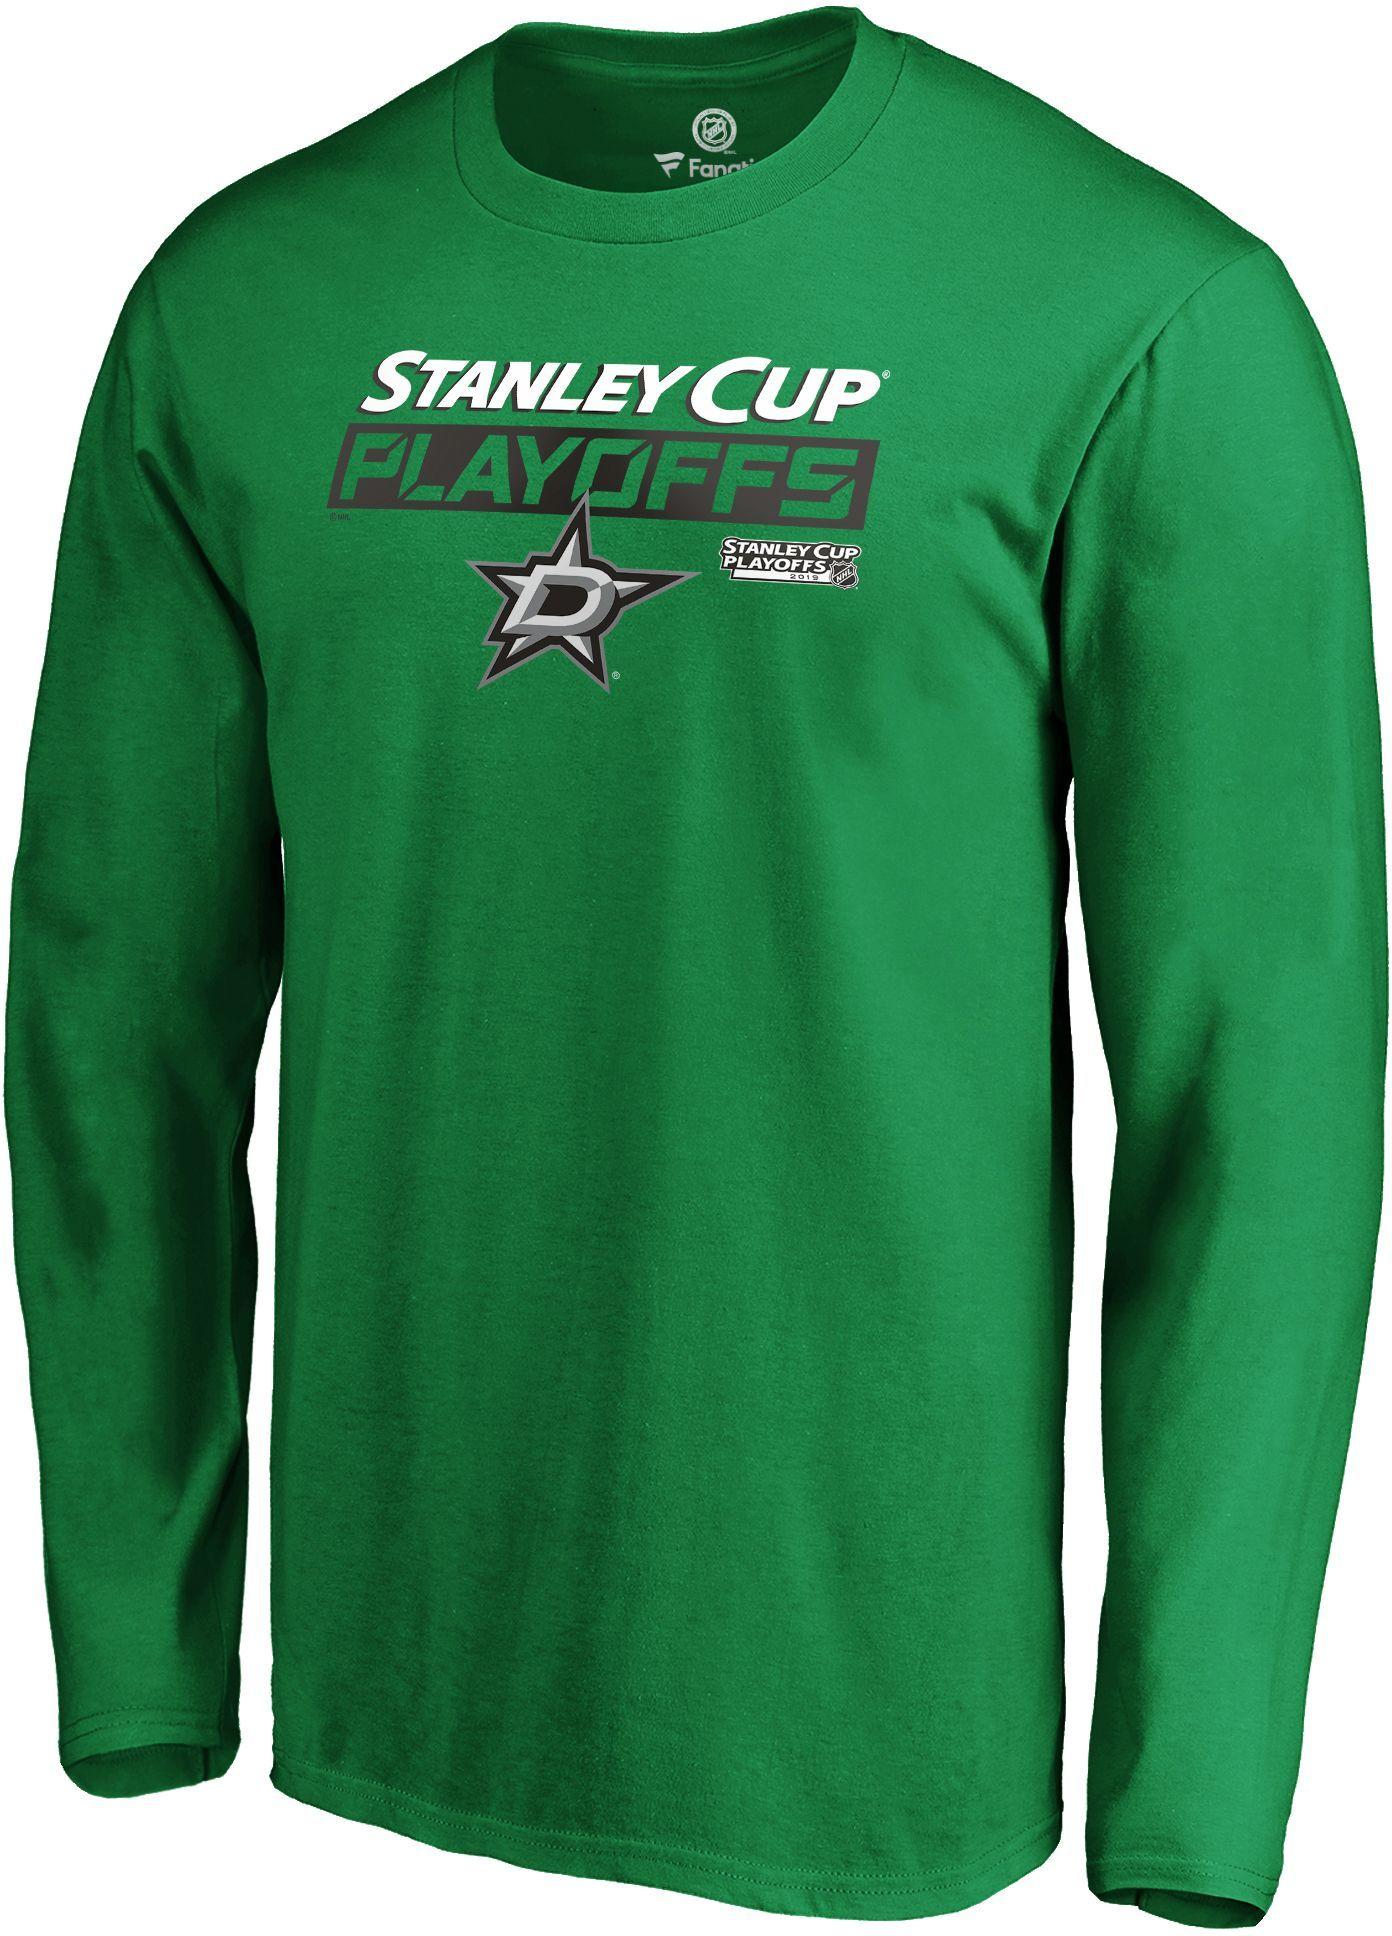 Nhl Men S Dallas Stars 2019 Nhl Stanley Cup Playoffs Green Long Sleeve Shirt Green Long Sleeve Shirt Long Sleeve Shirts Long Sleeve Tshirt Men